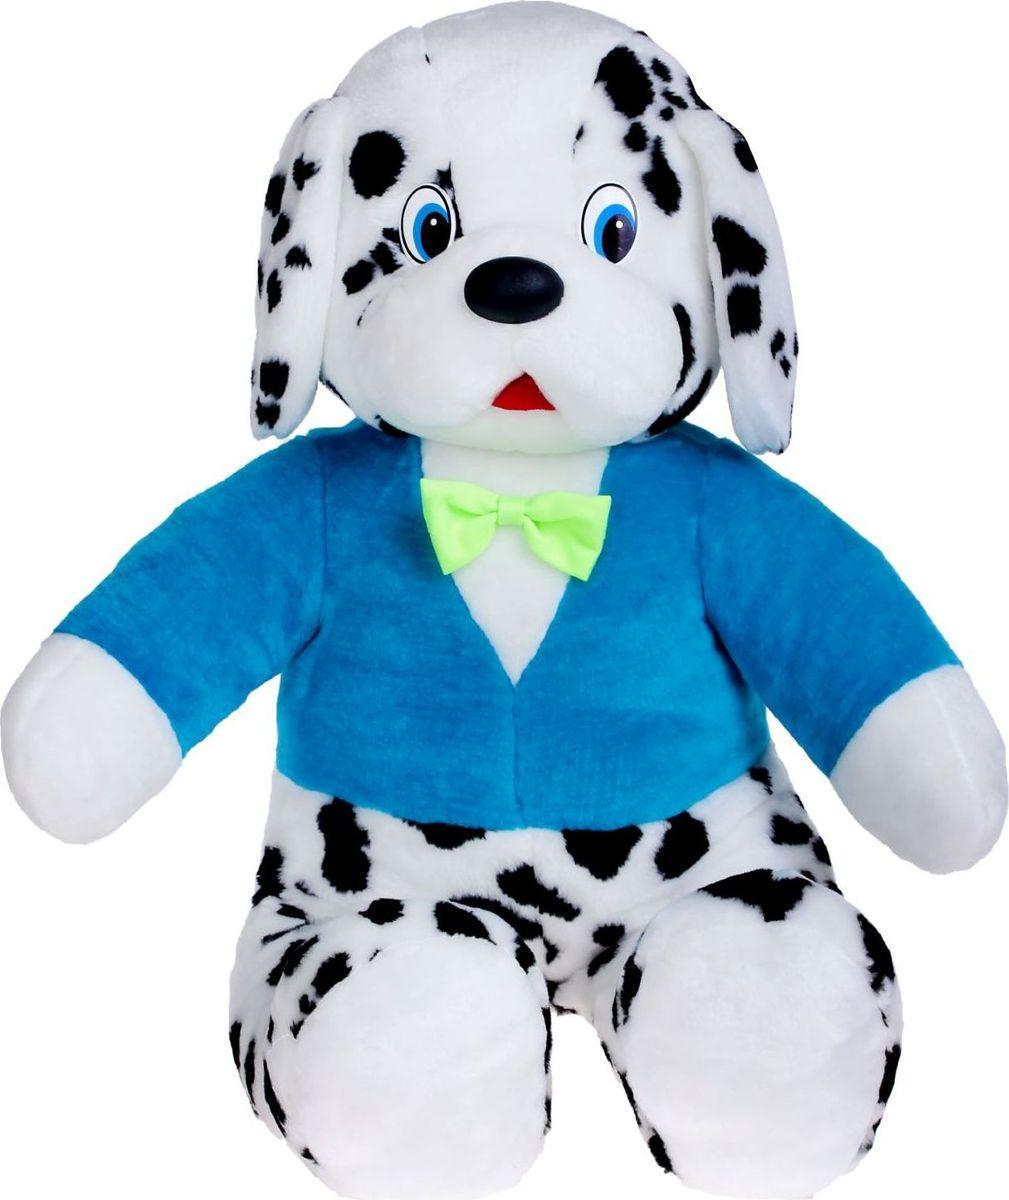 Sima-land Мягкая игрушка Собака Том 90 см sima land мягкая игрушка собака пятнашка 80 см